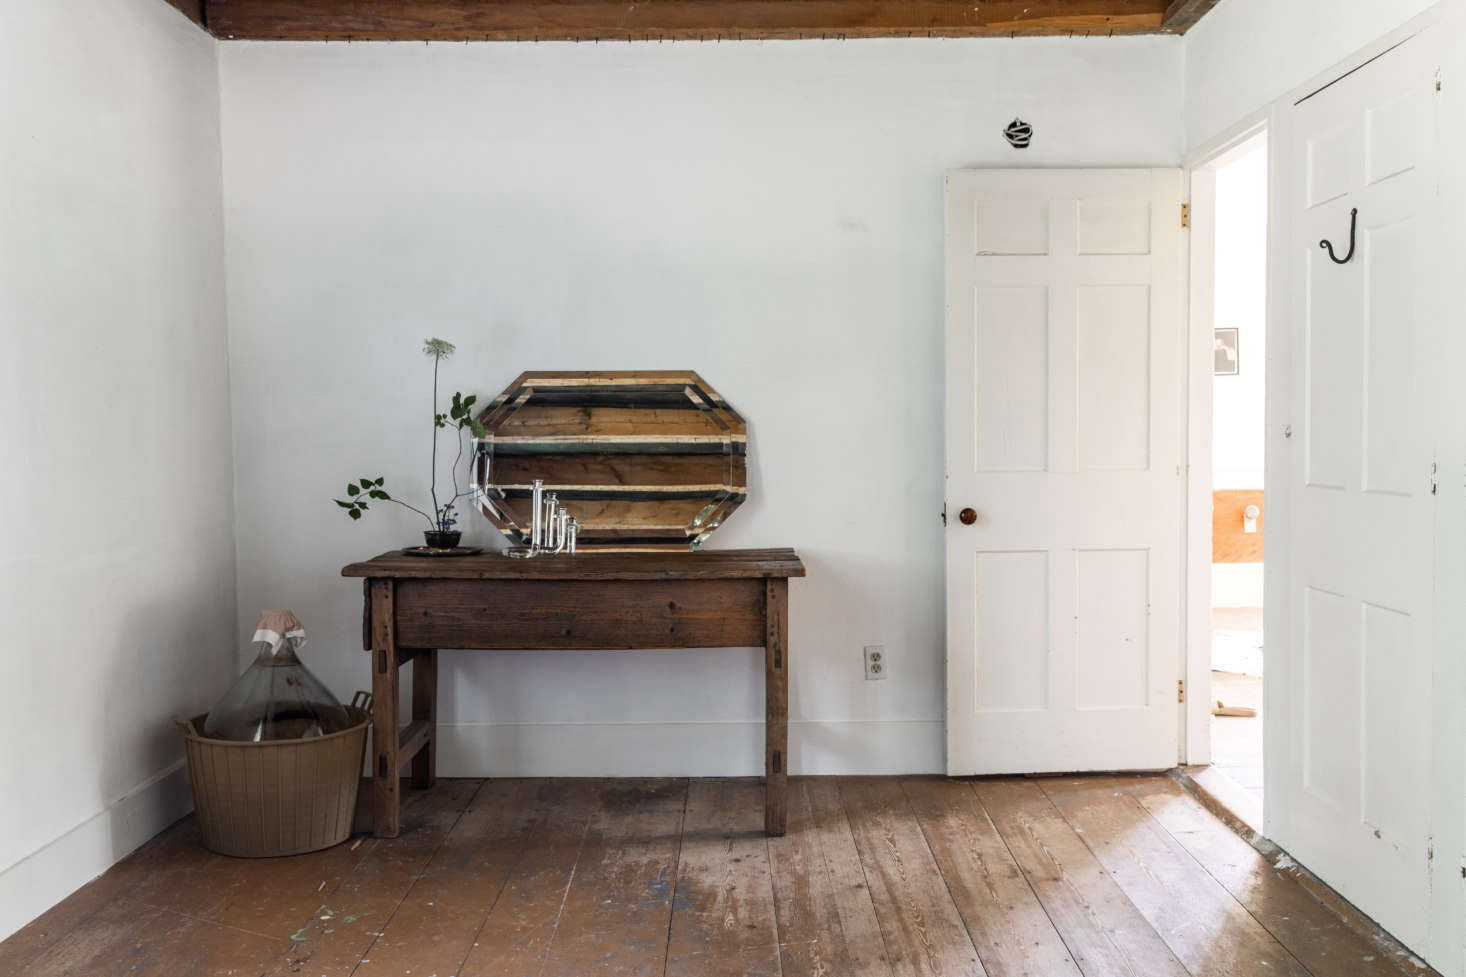 The House That Craigslist Built: A Bare-Bones Farmhouse in ...